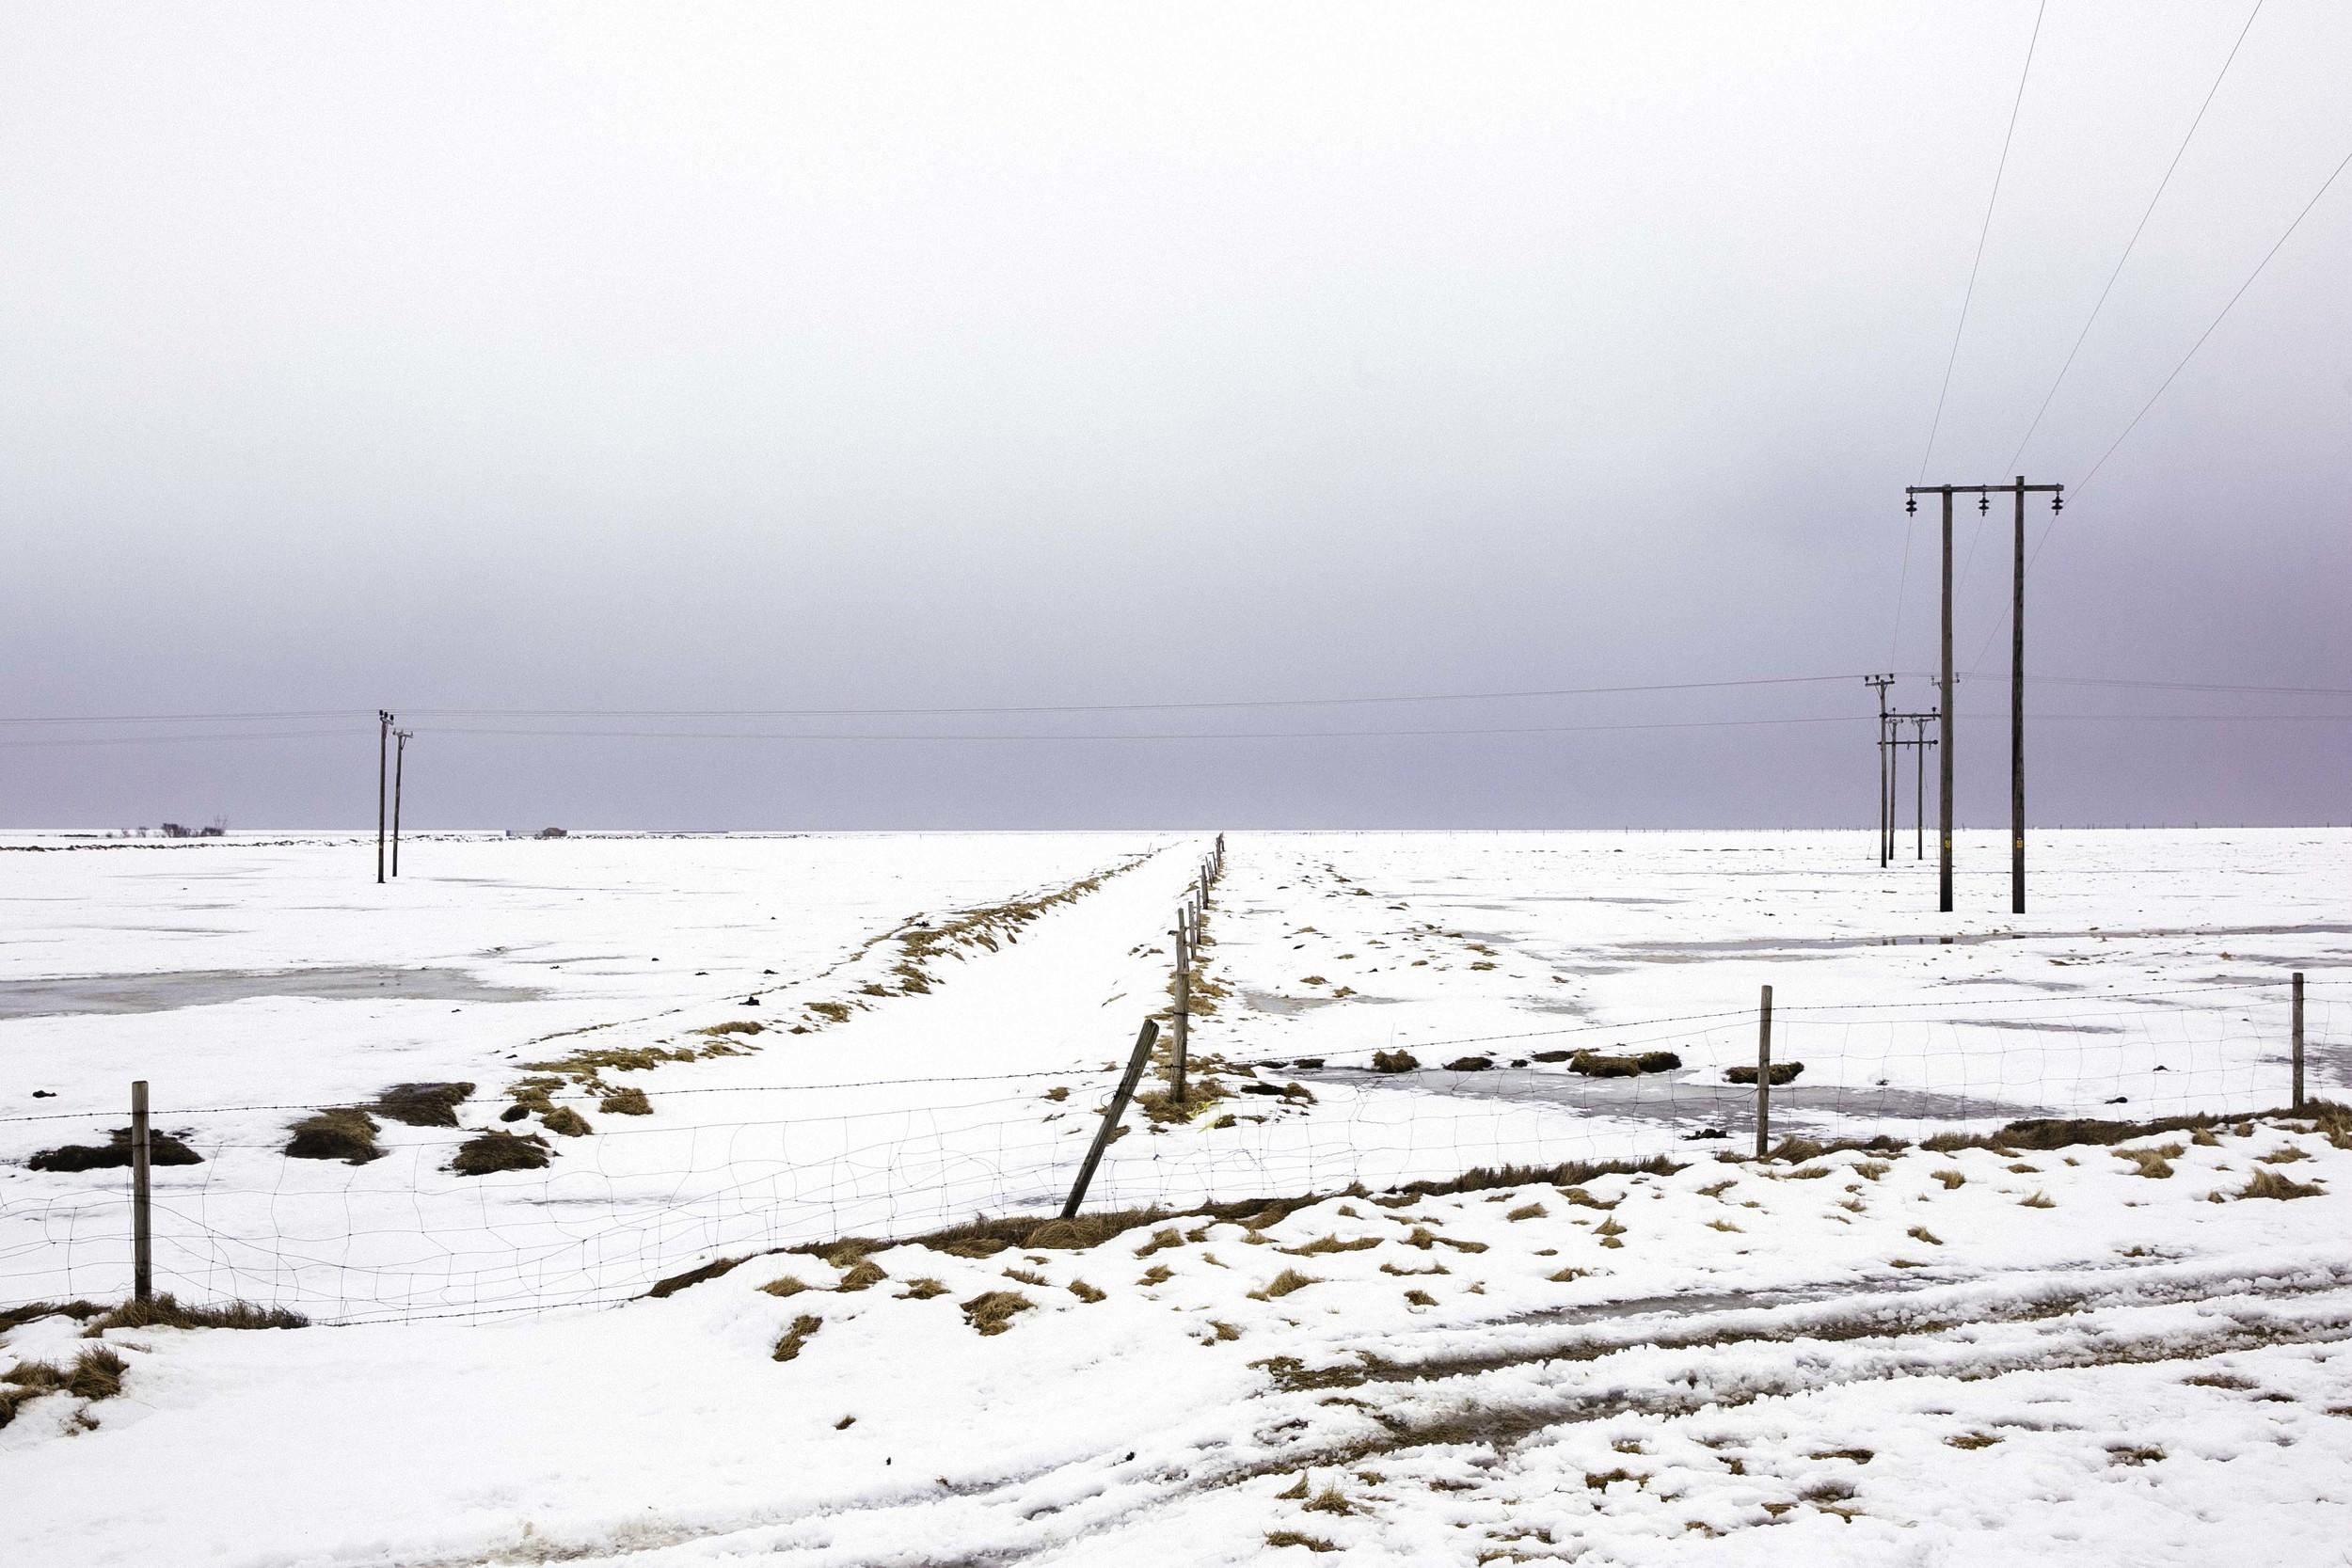 Iceland - Isolations-8068.jpg